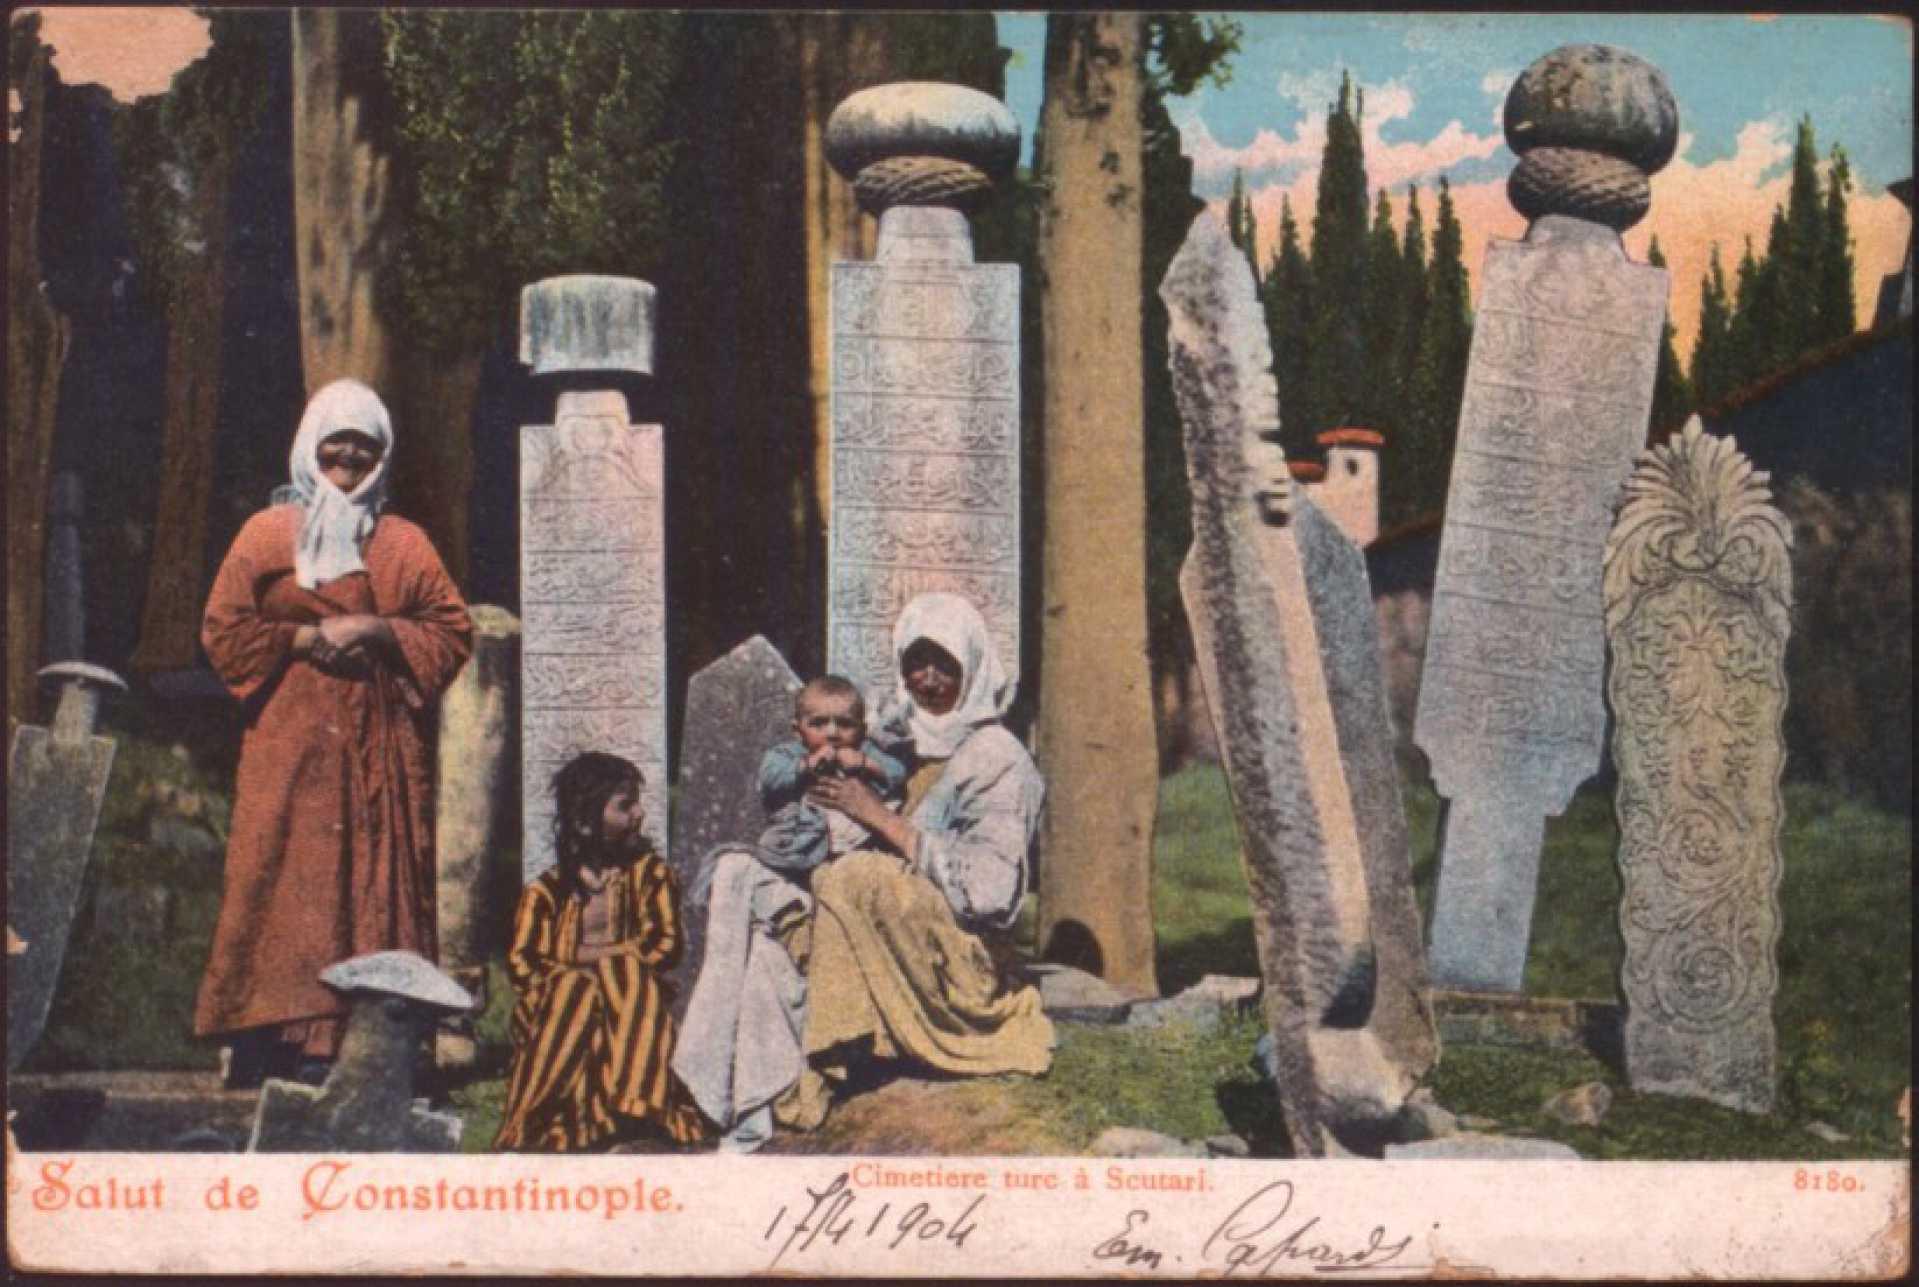 Cimetiere turc a Scutari